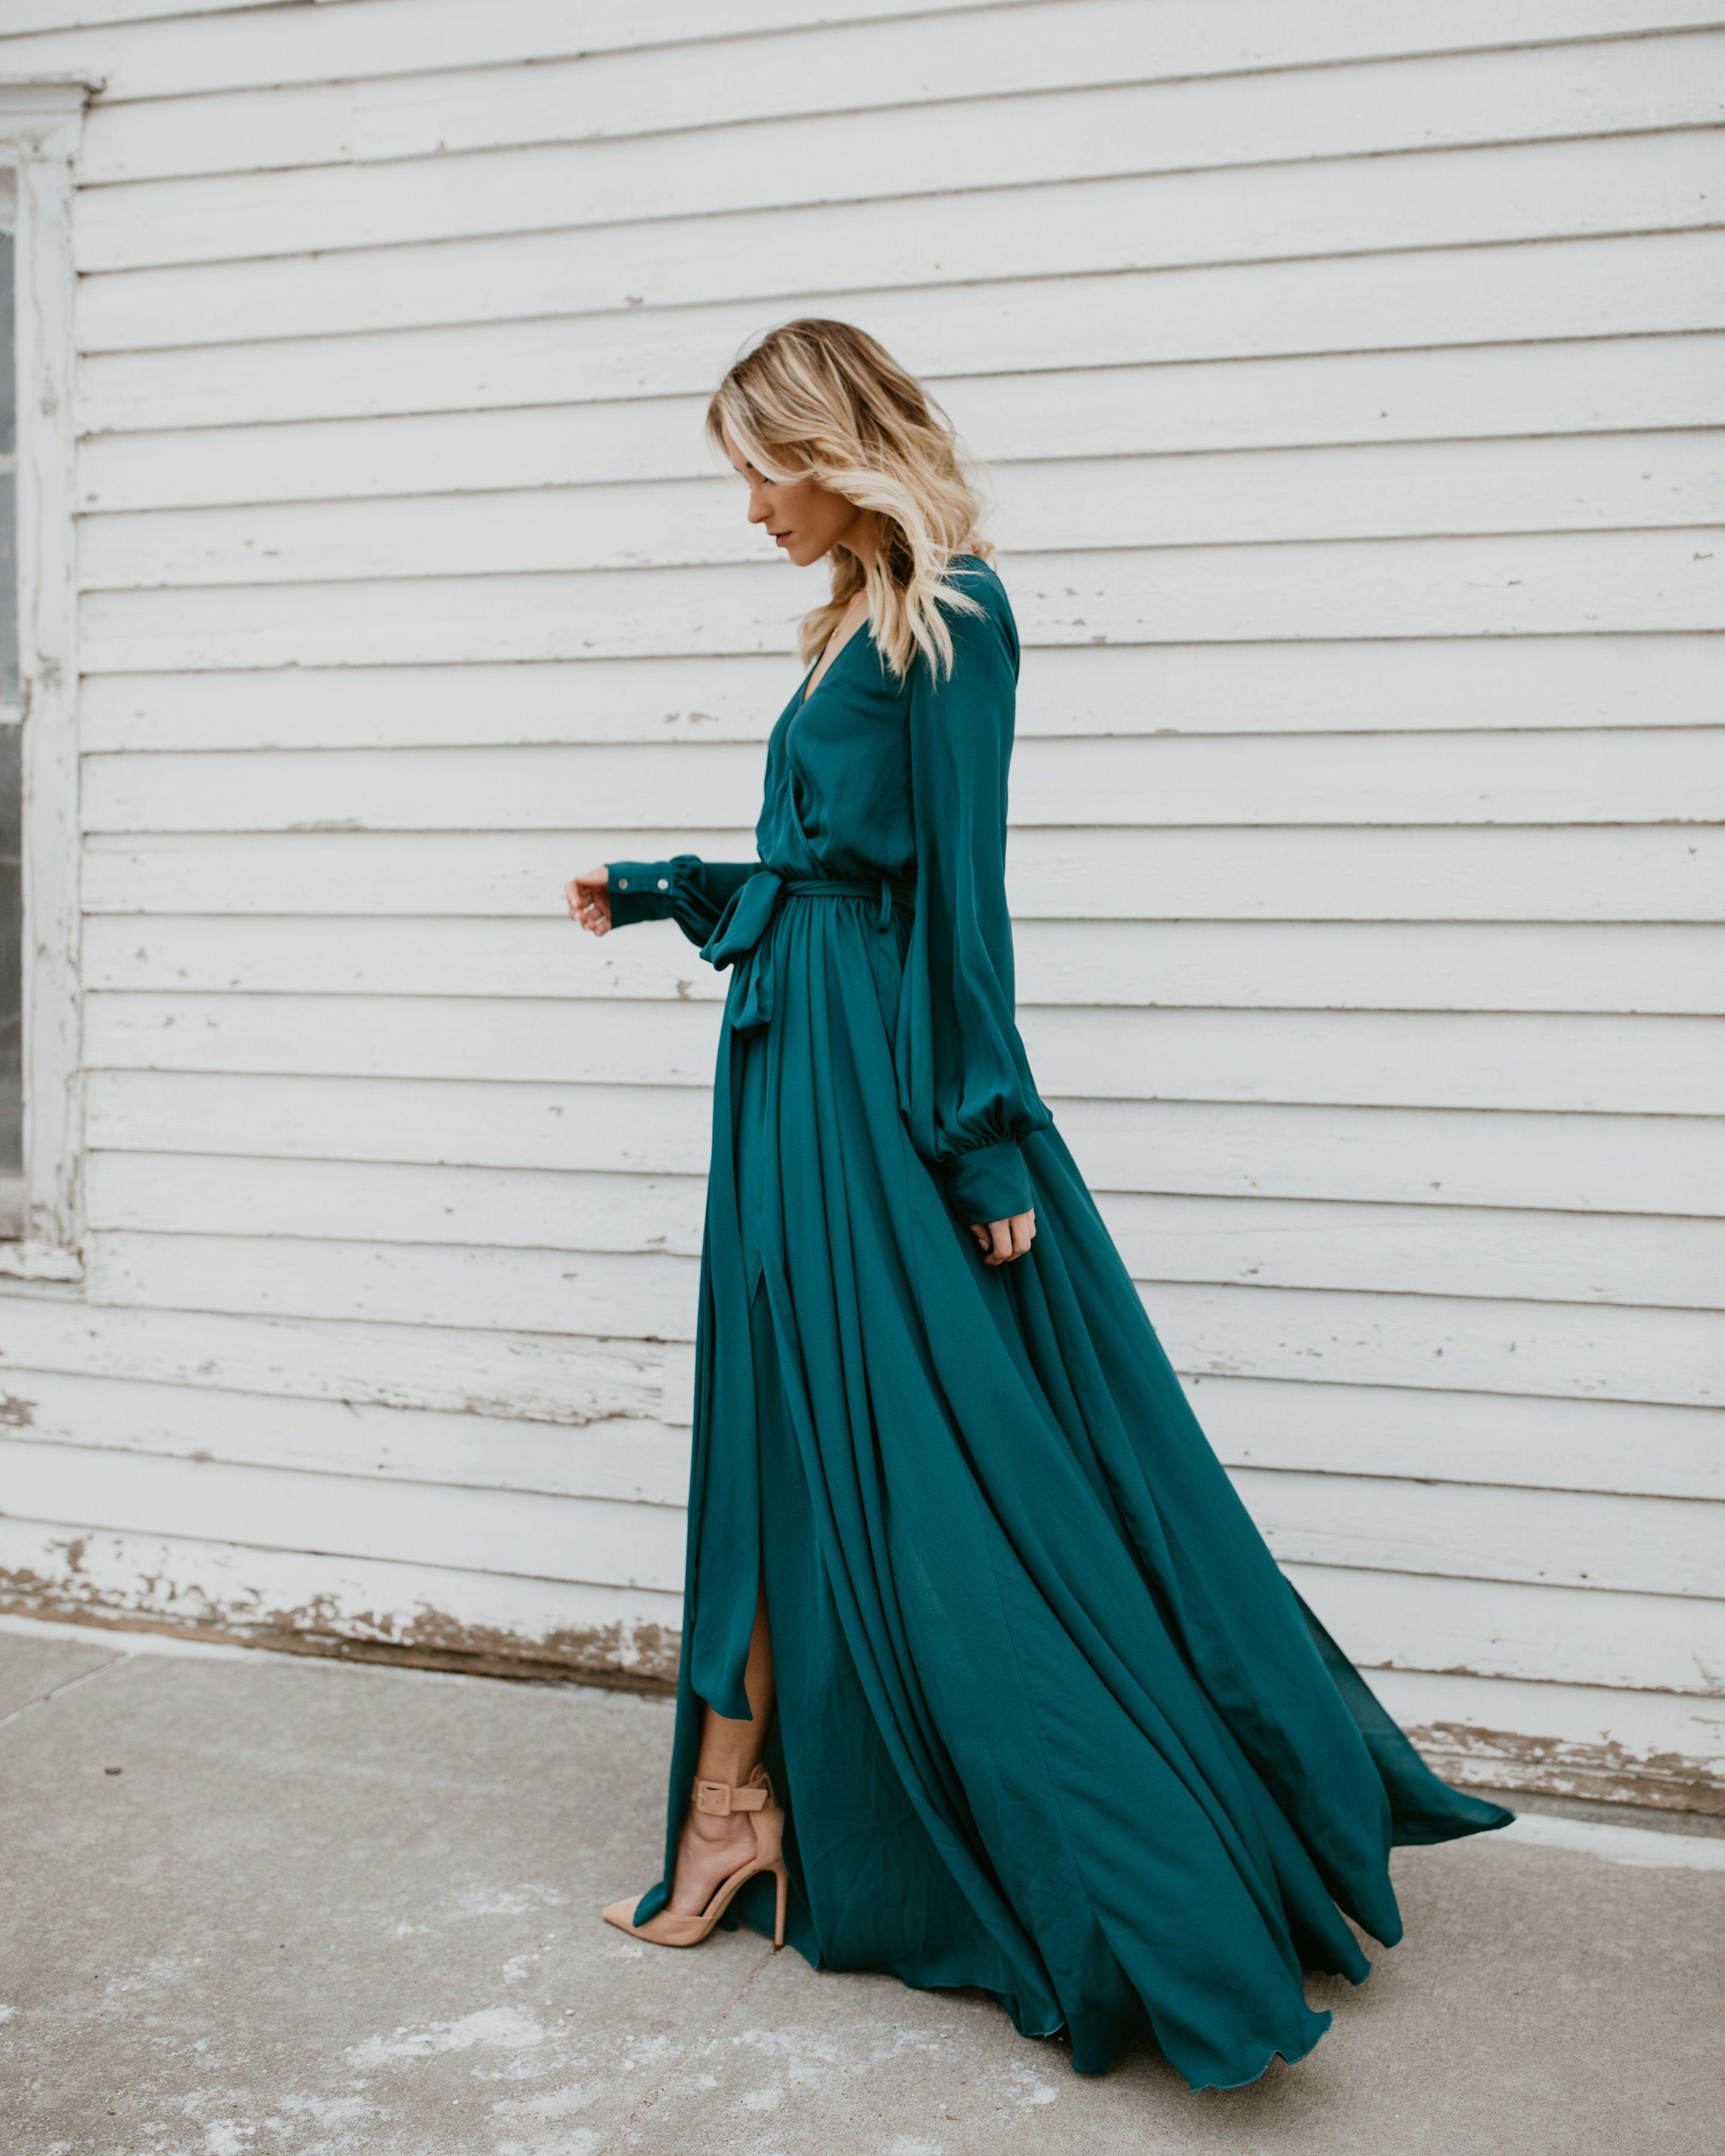 Long Sleeve Diana Maxi Dress Dark Teal Teal Maxi Dress Dark Teal Dress Teal Dress Outfit [ 3600 x 2880 Pixel ]